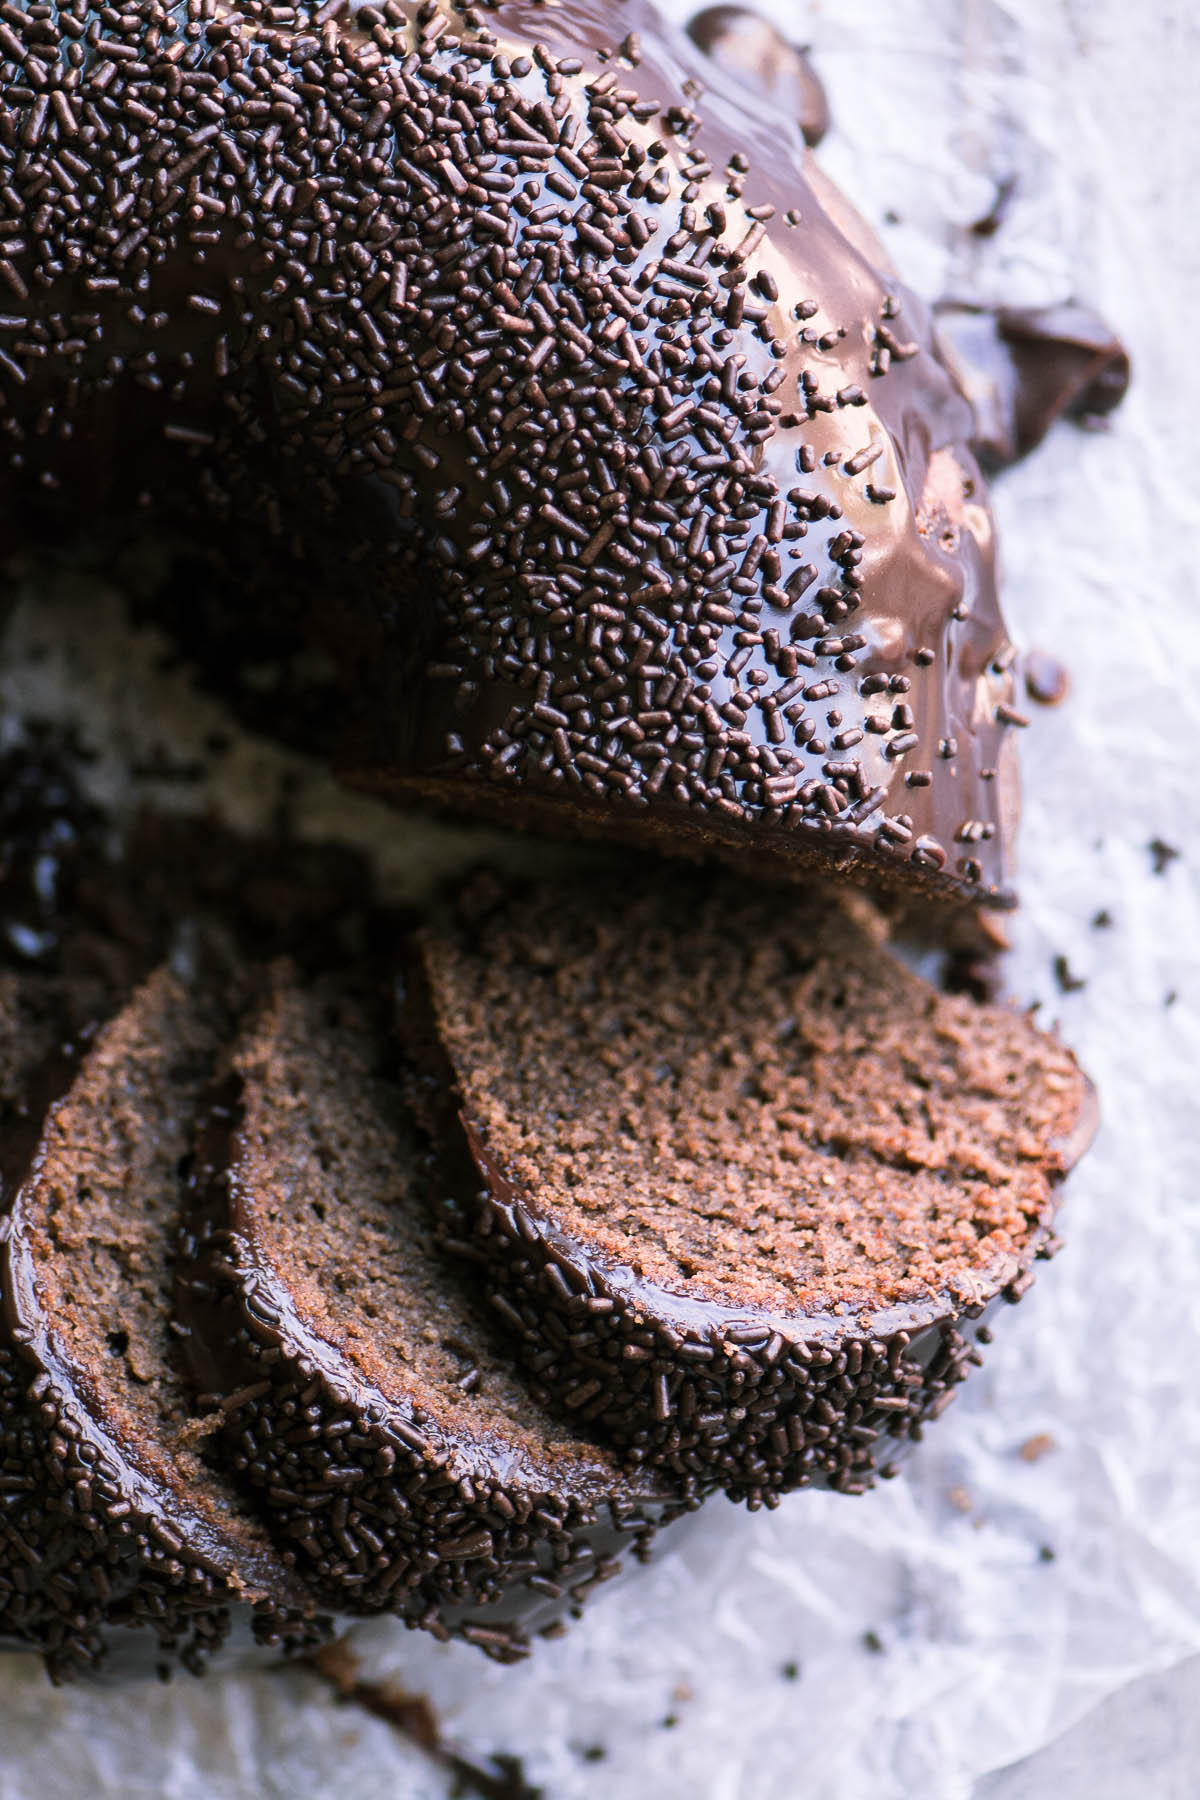 Chocolate Sour Cream Doughnut Bundt Cake, sliced, with sprinkles